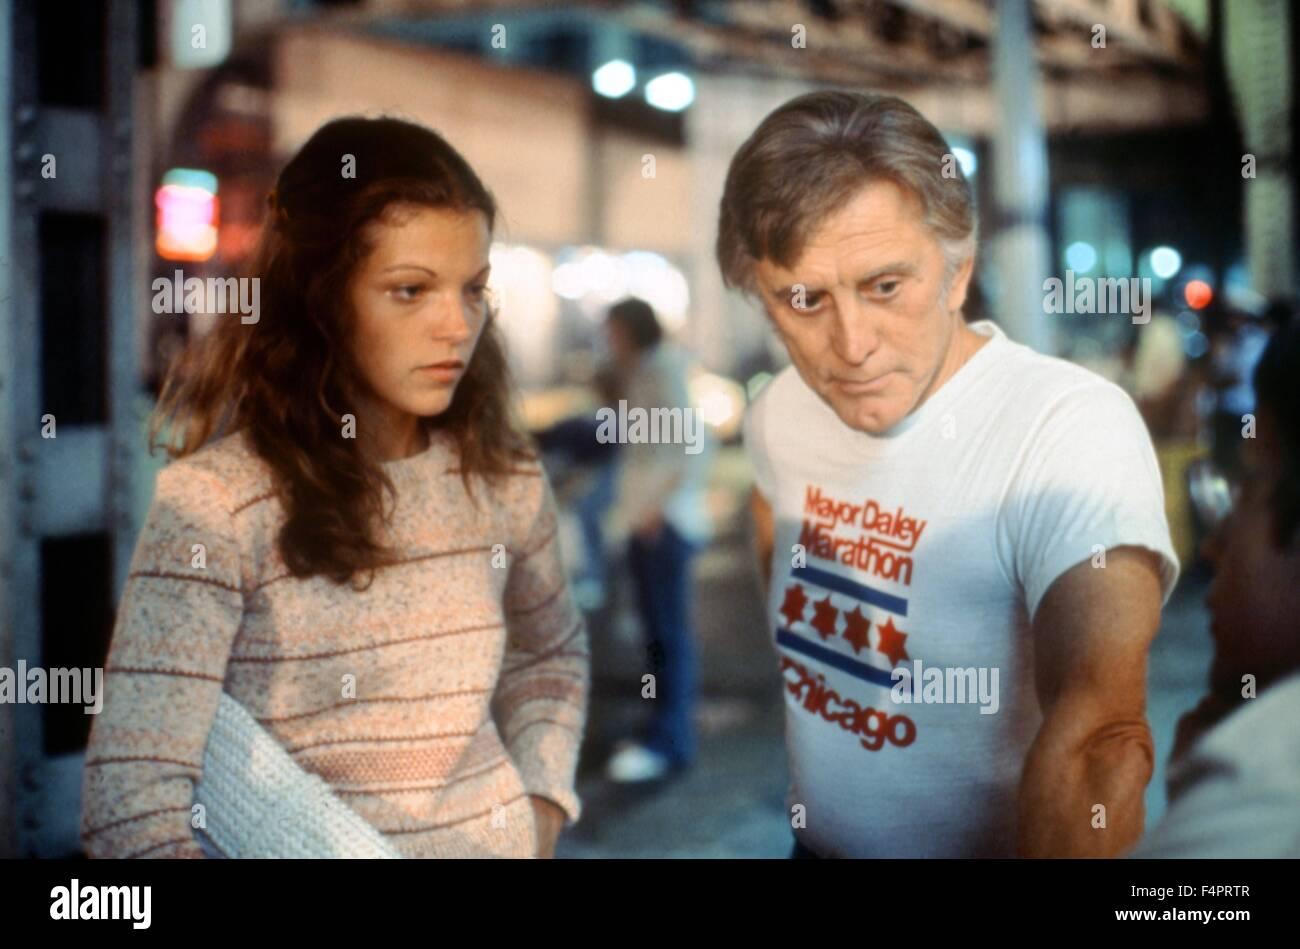 Amy Irving and Kirk Douglas / The Fury / 1978 directed by Brian De Palma [Twentieth Century Fox Film Corpo] - Stock Image